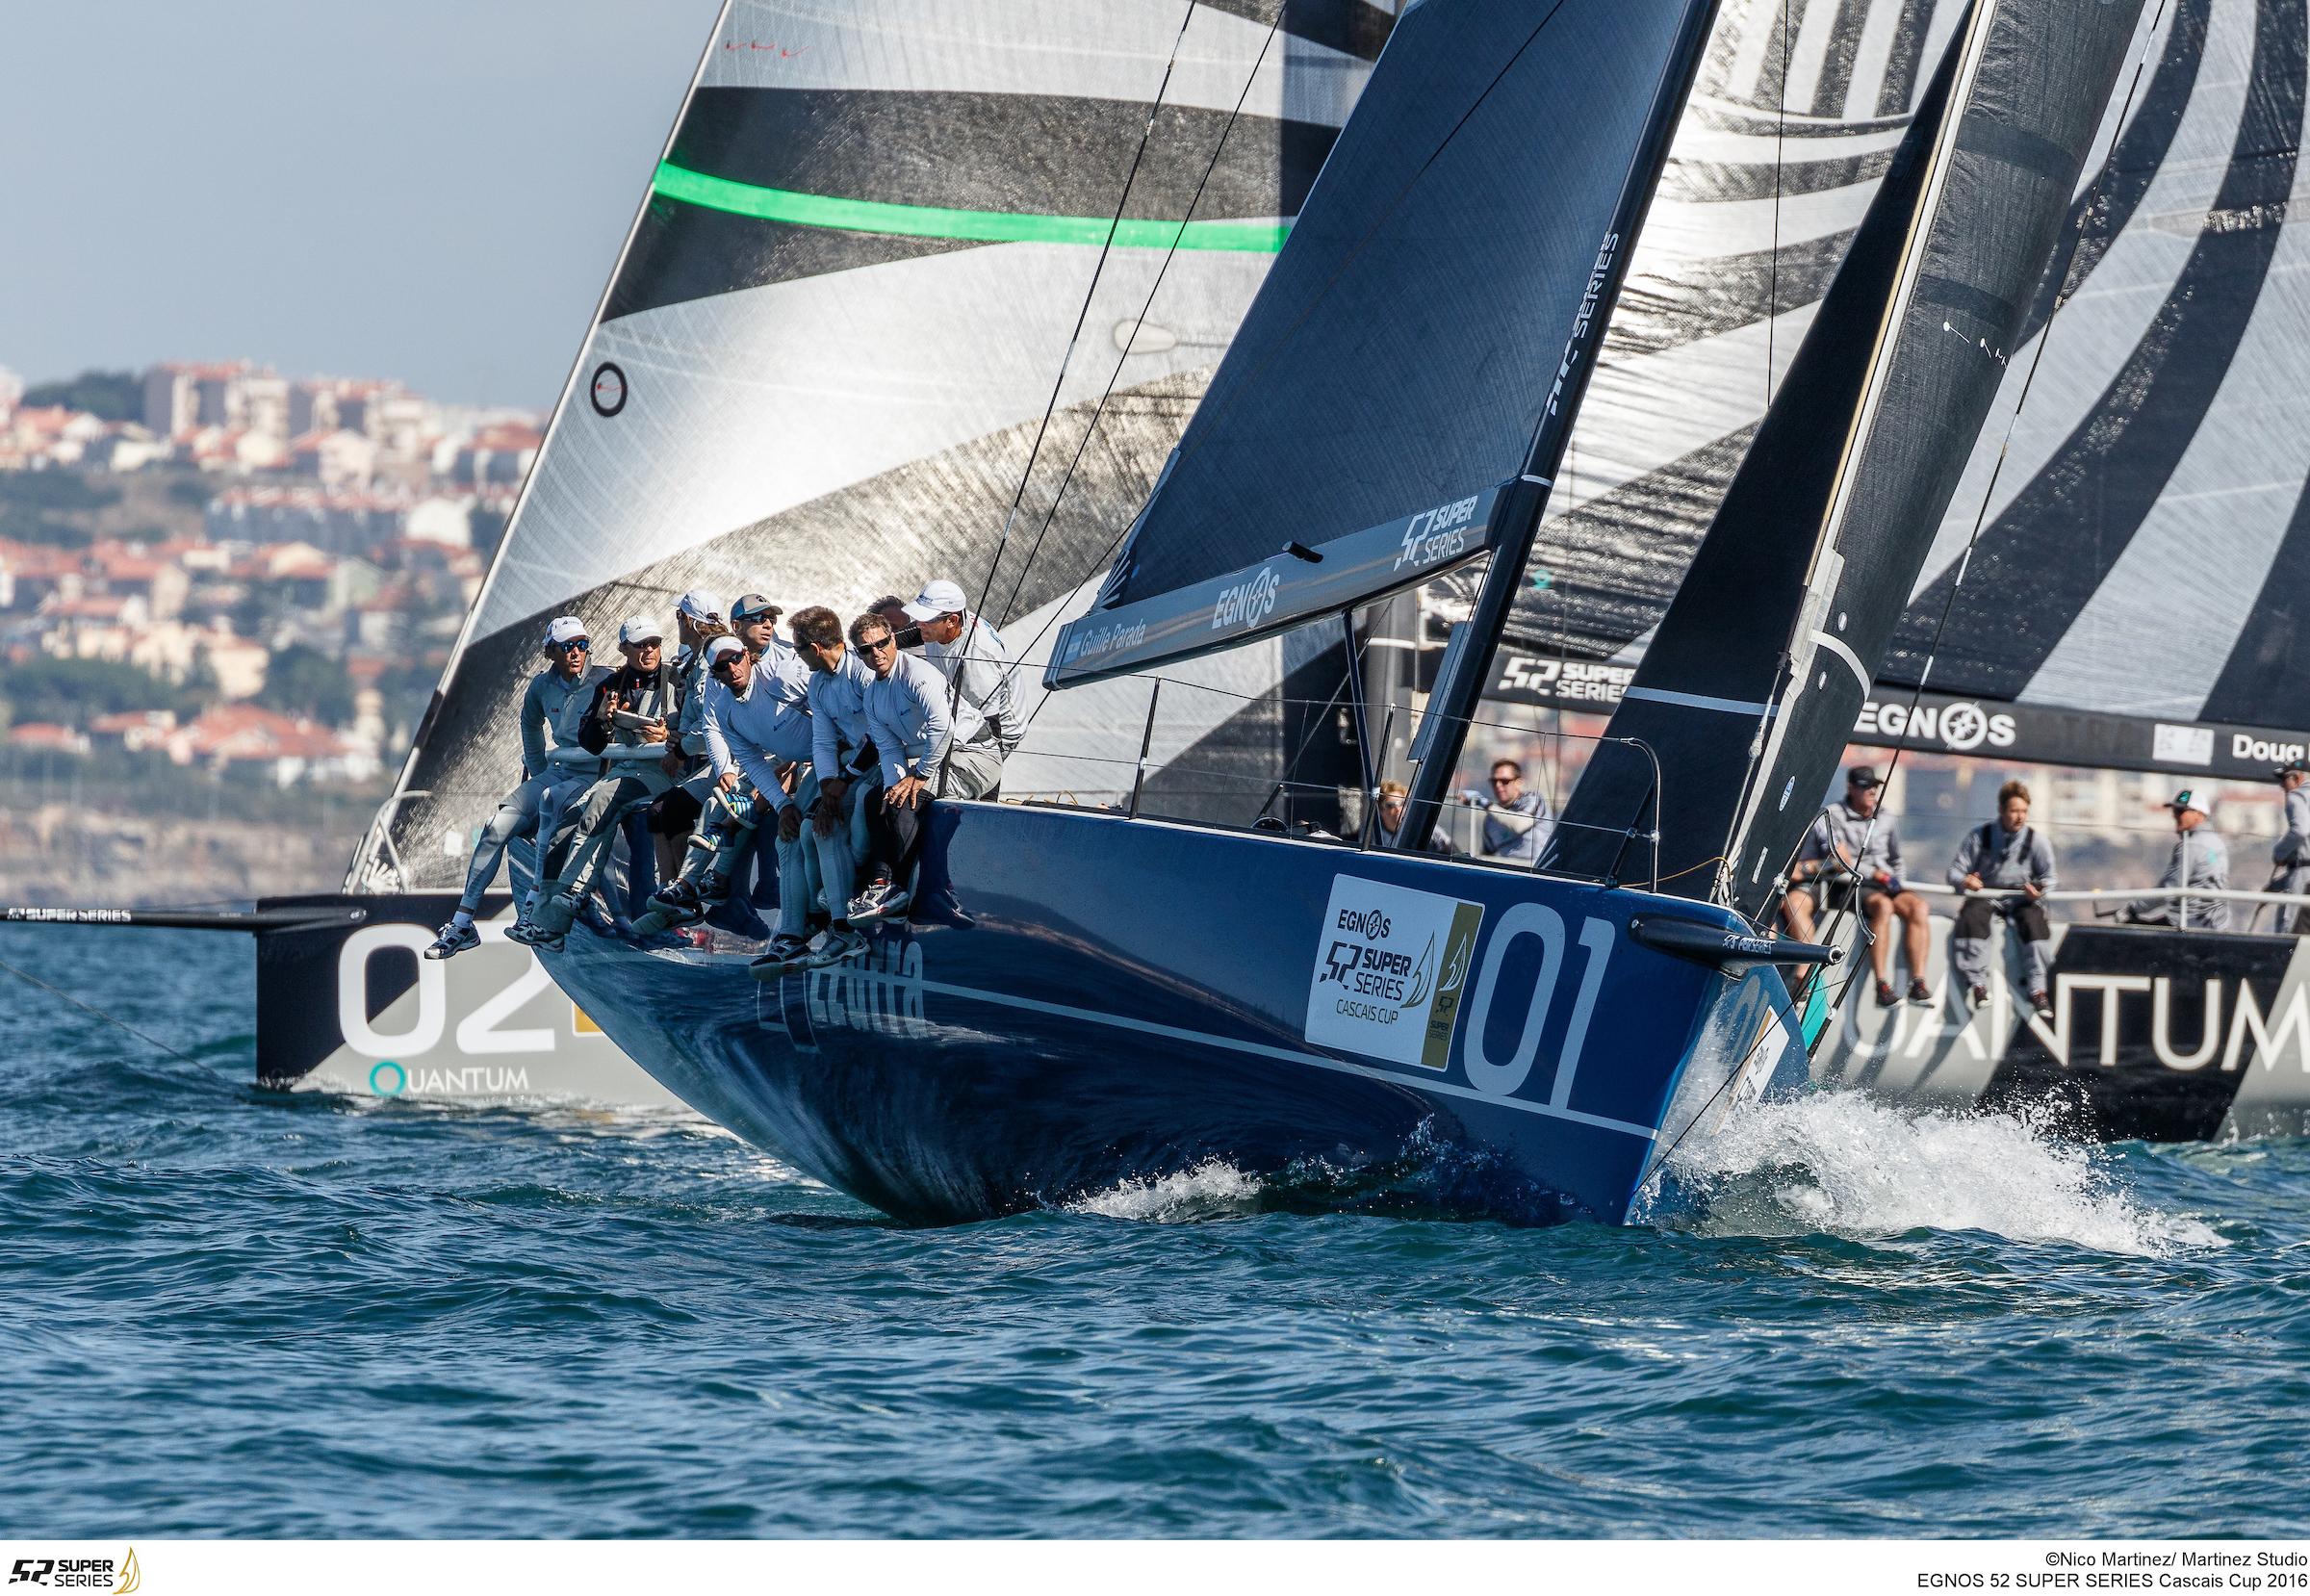 Azzurra leads Quantum Racing in the final regatta of the 52 Super Series. Photo Nico Martinez / Martinez Studio.